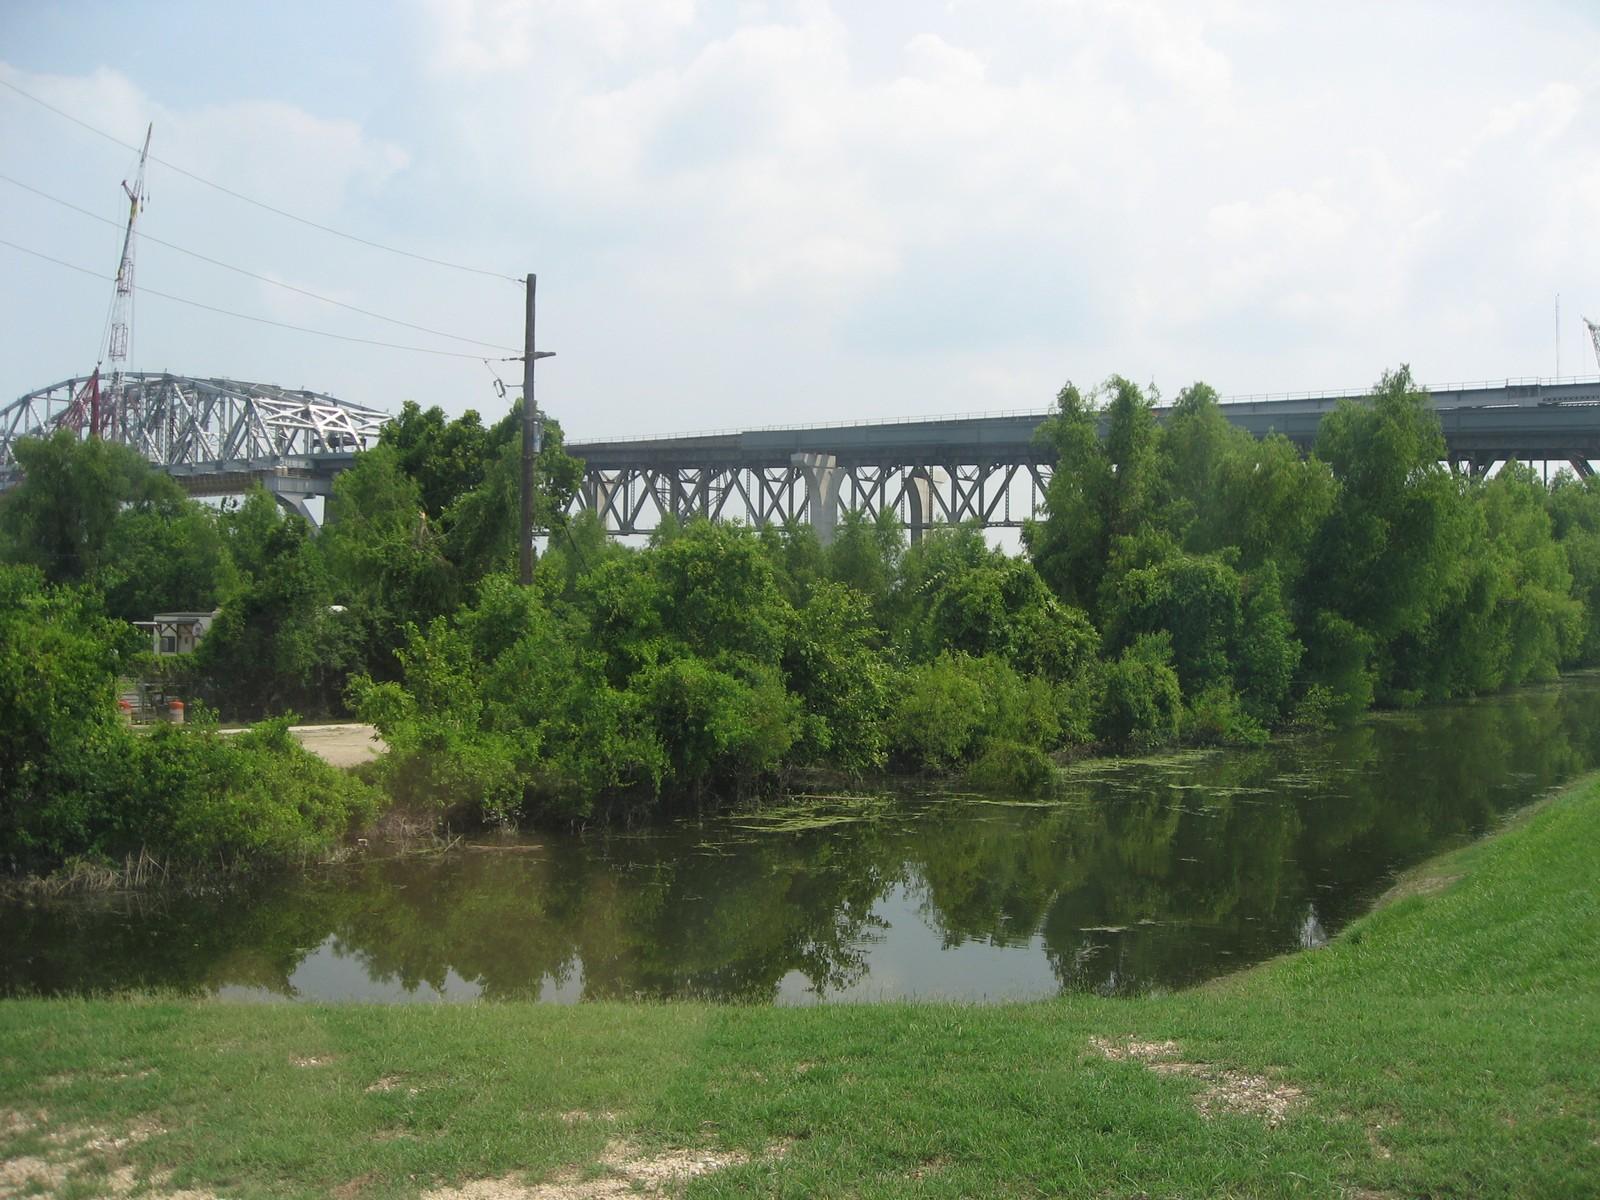 Huey P. Long Bridge from the River Bank